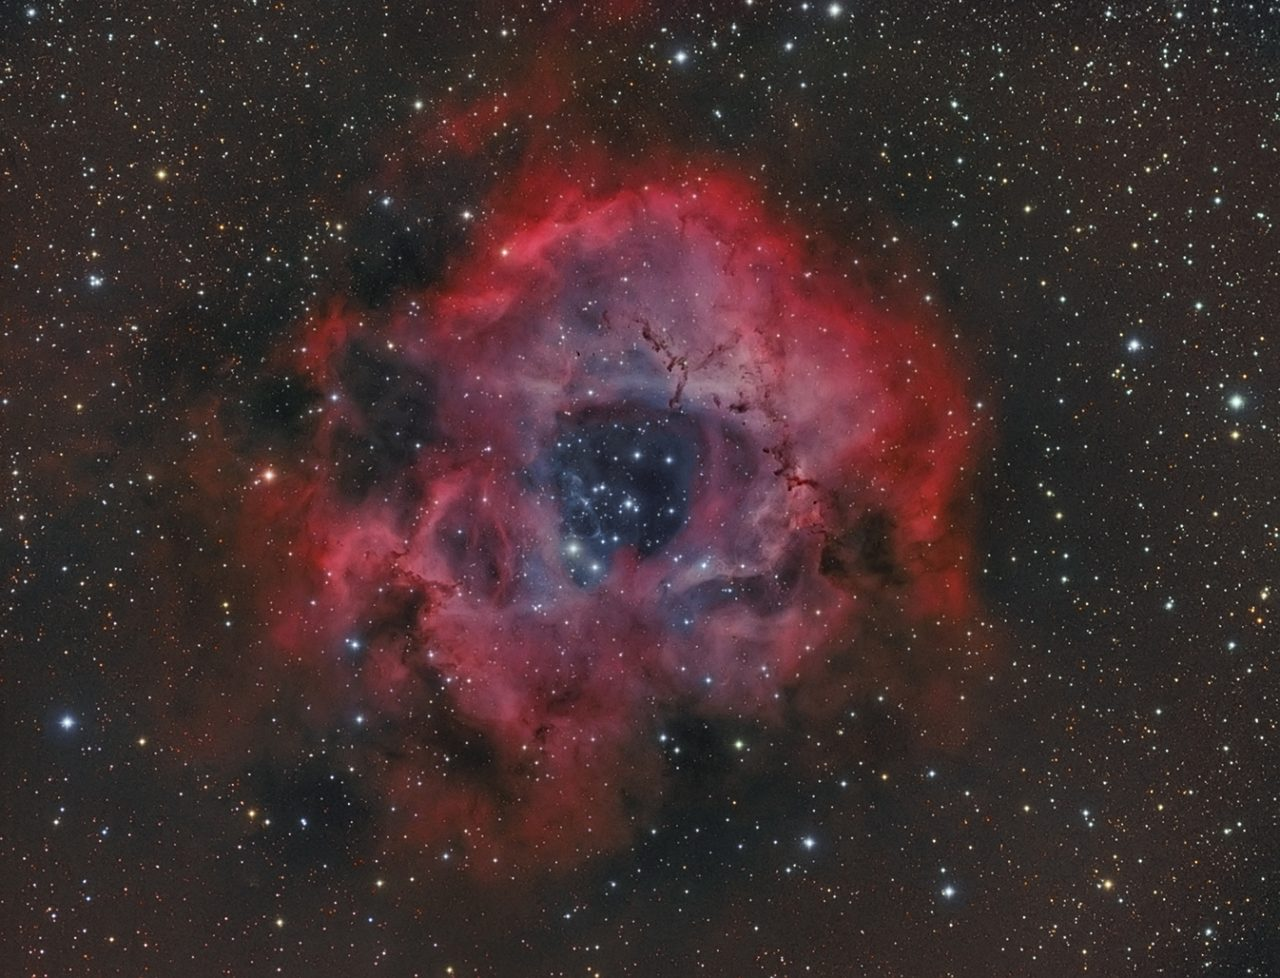 NGC 2244-Rosettennebel, von Paul Schuberth